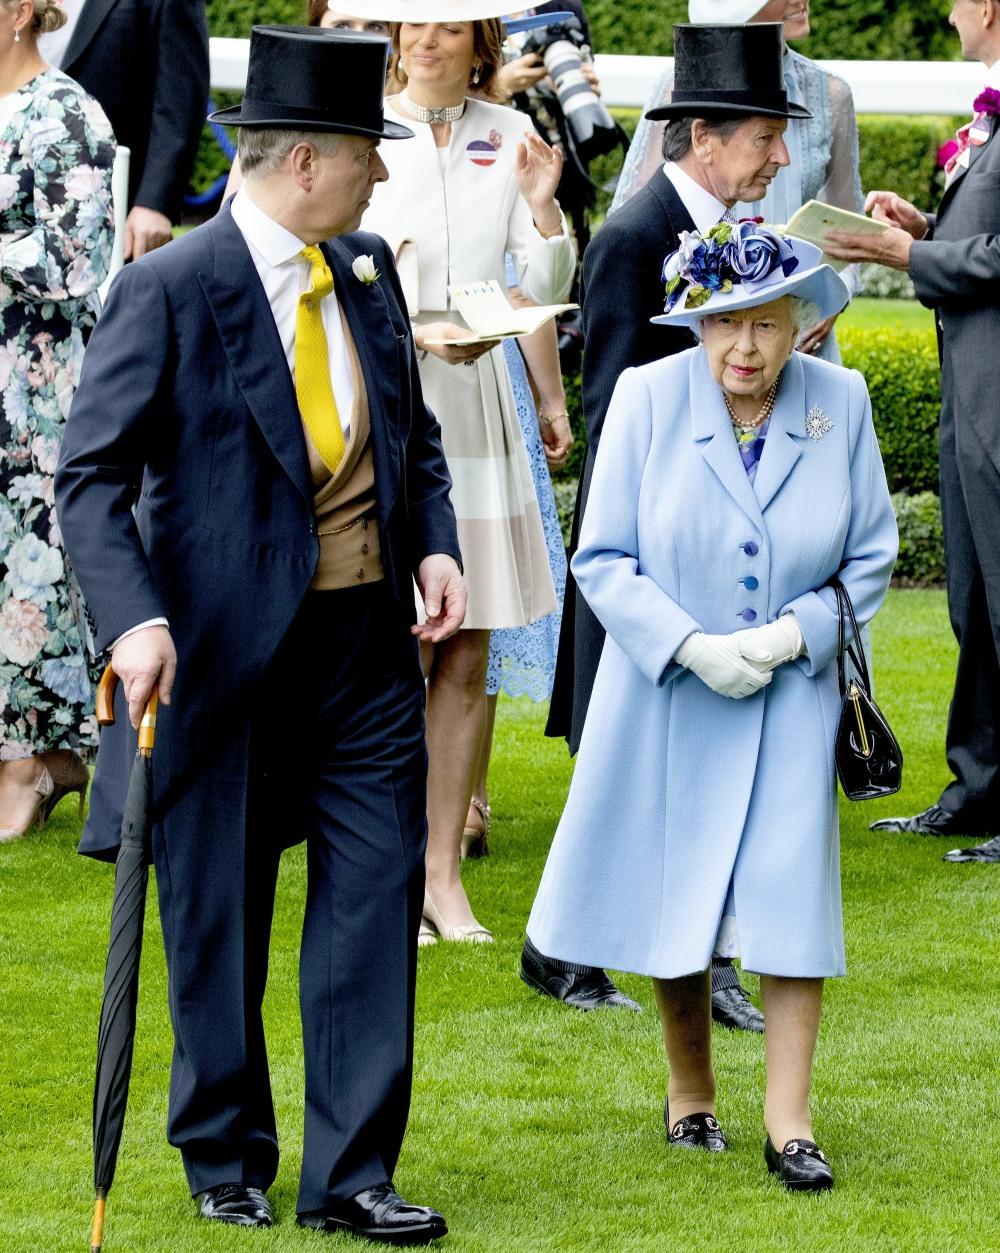 Royal AscotPhoto: Albert Nieboer / Netherlands OUT / Point De Vue OUT